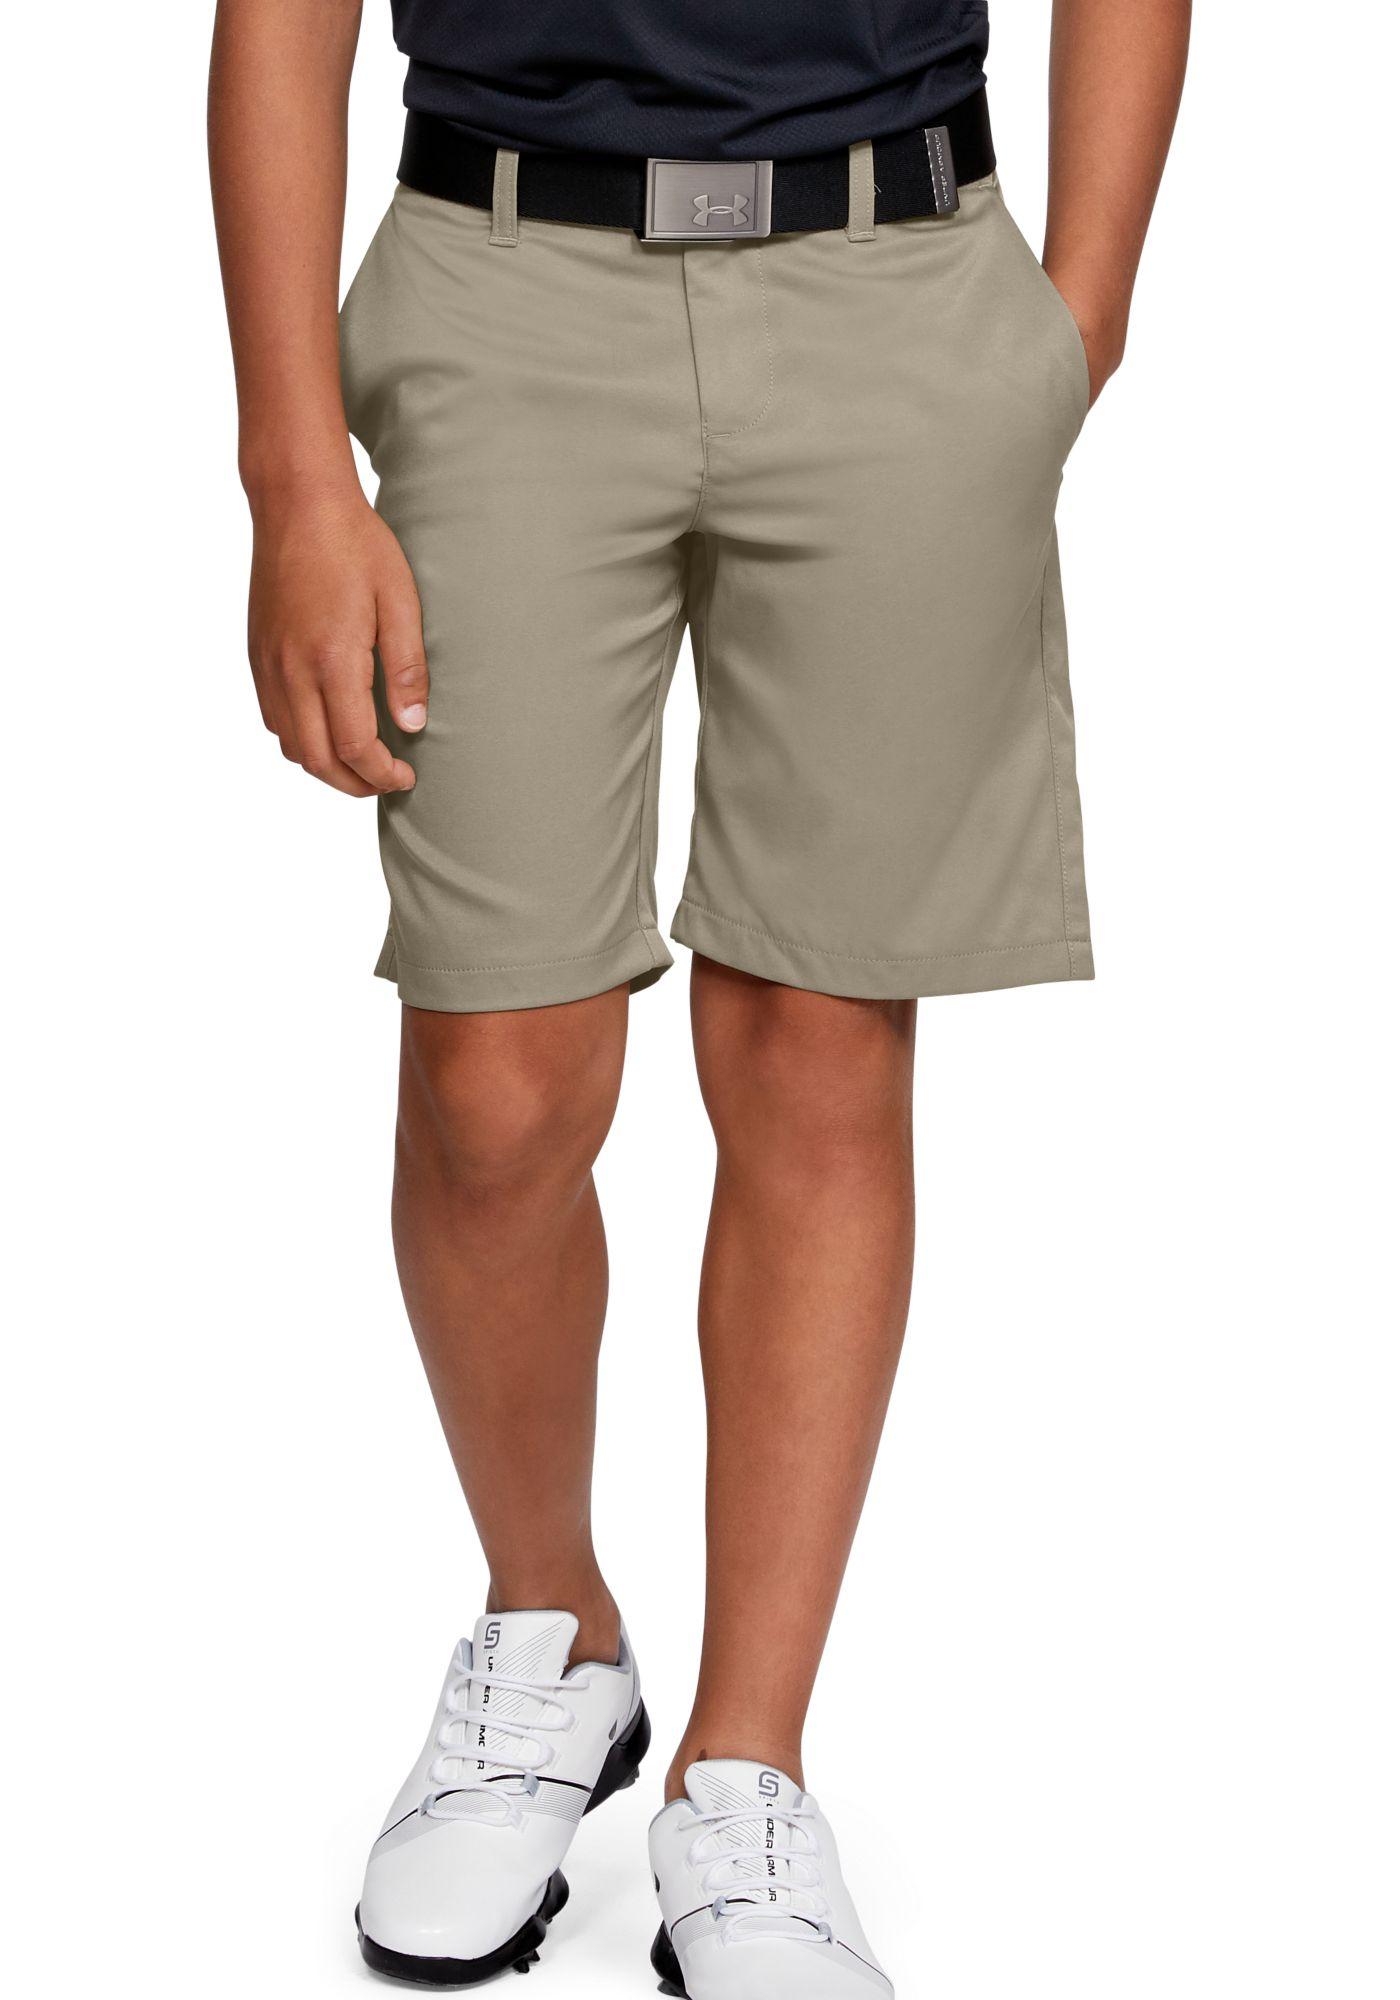 Under Armour Boys' Match Play 2.0 Golf Shorts